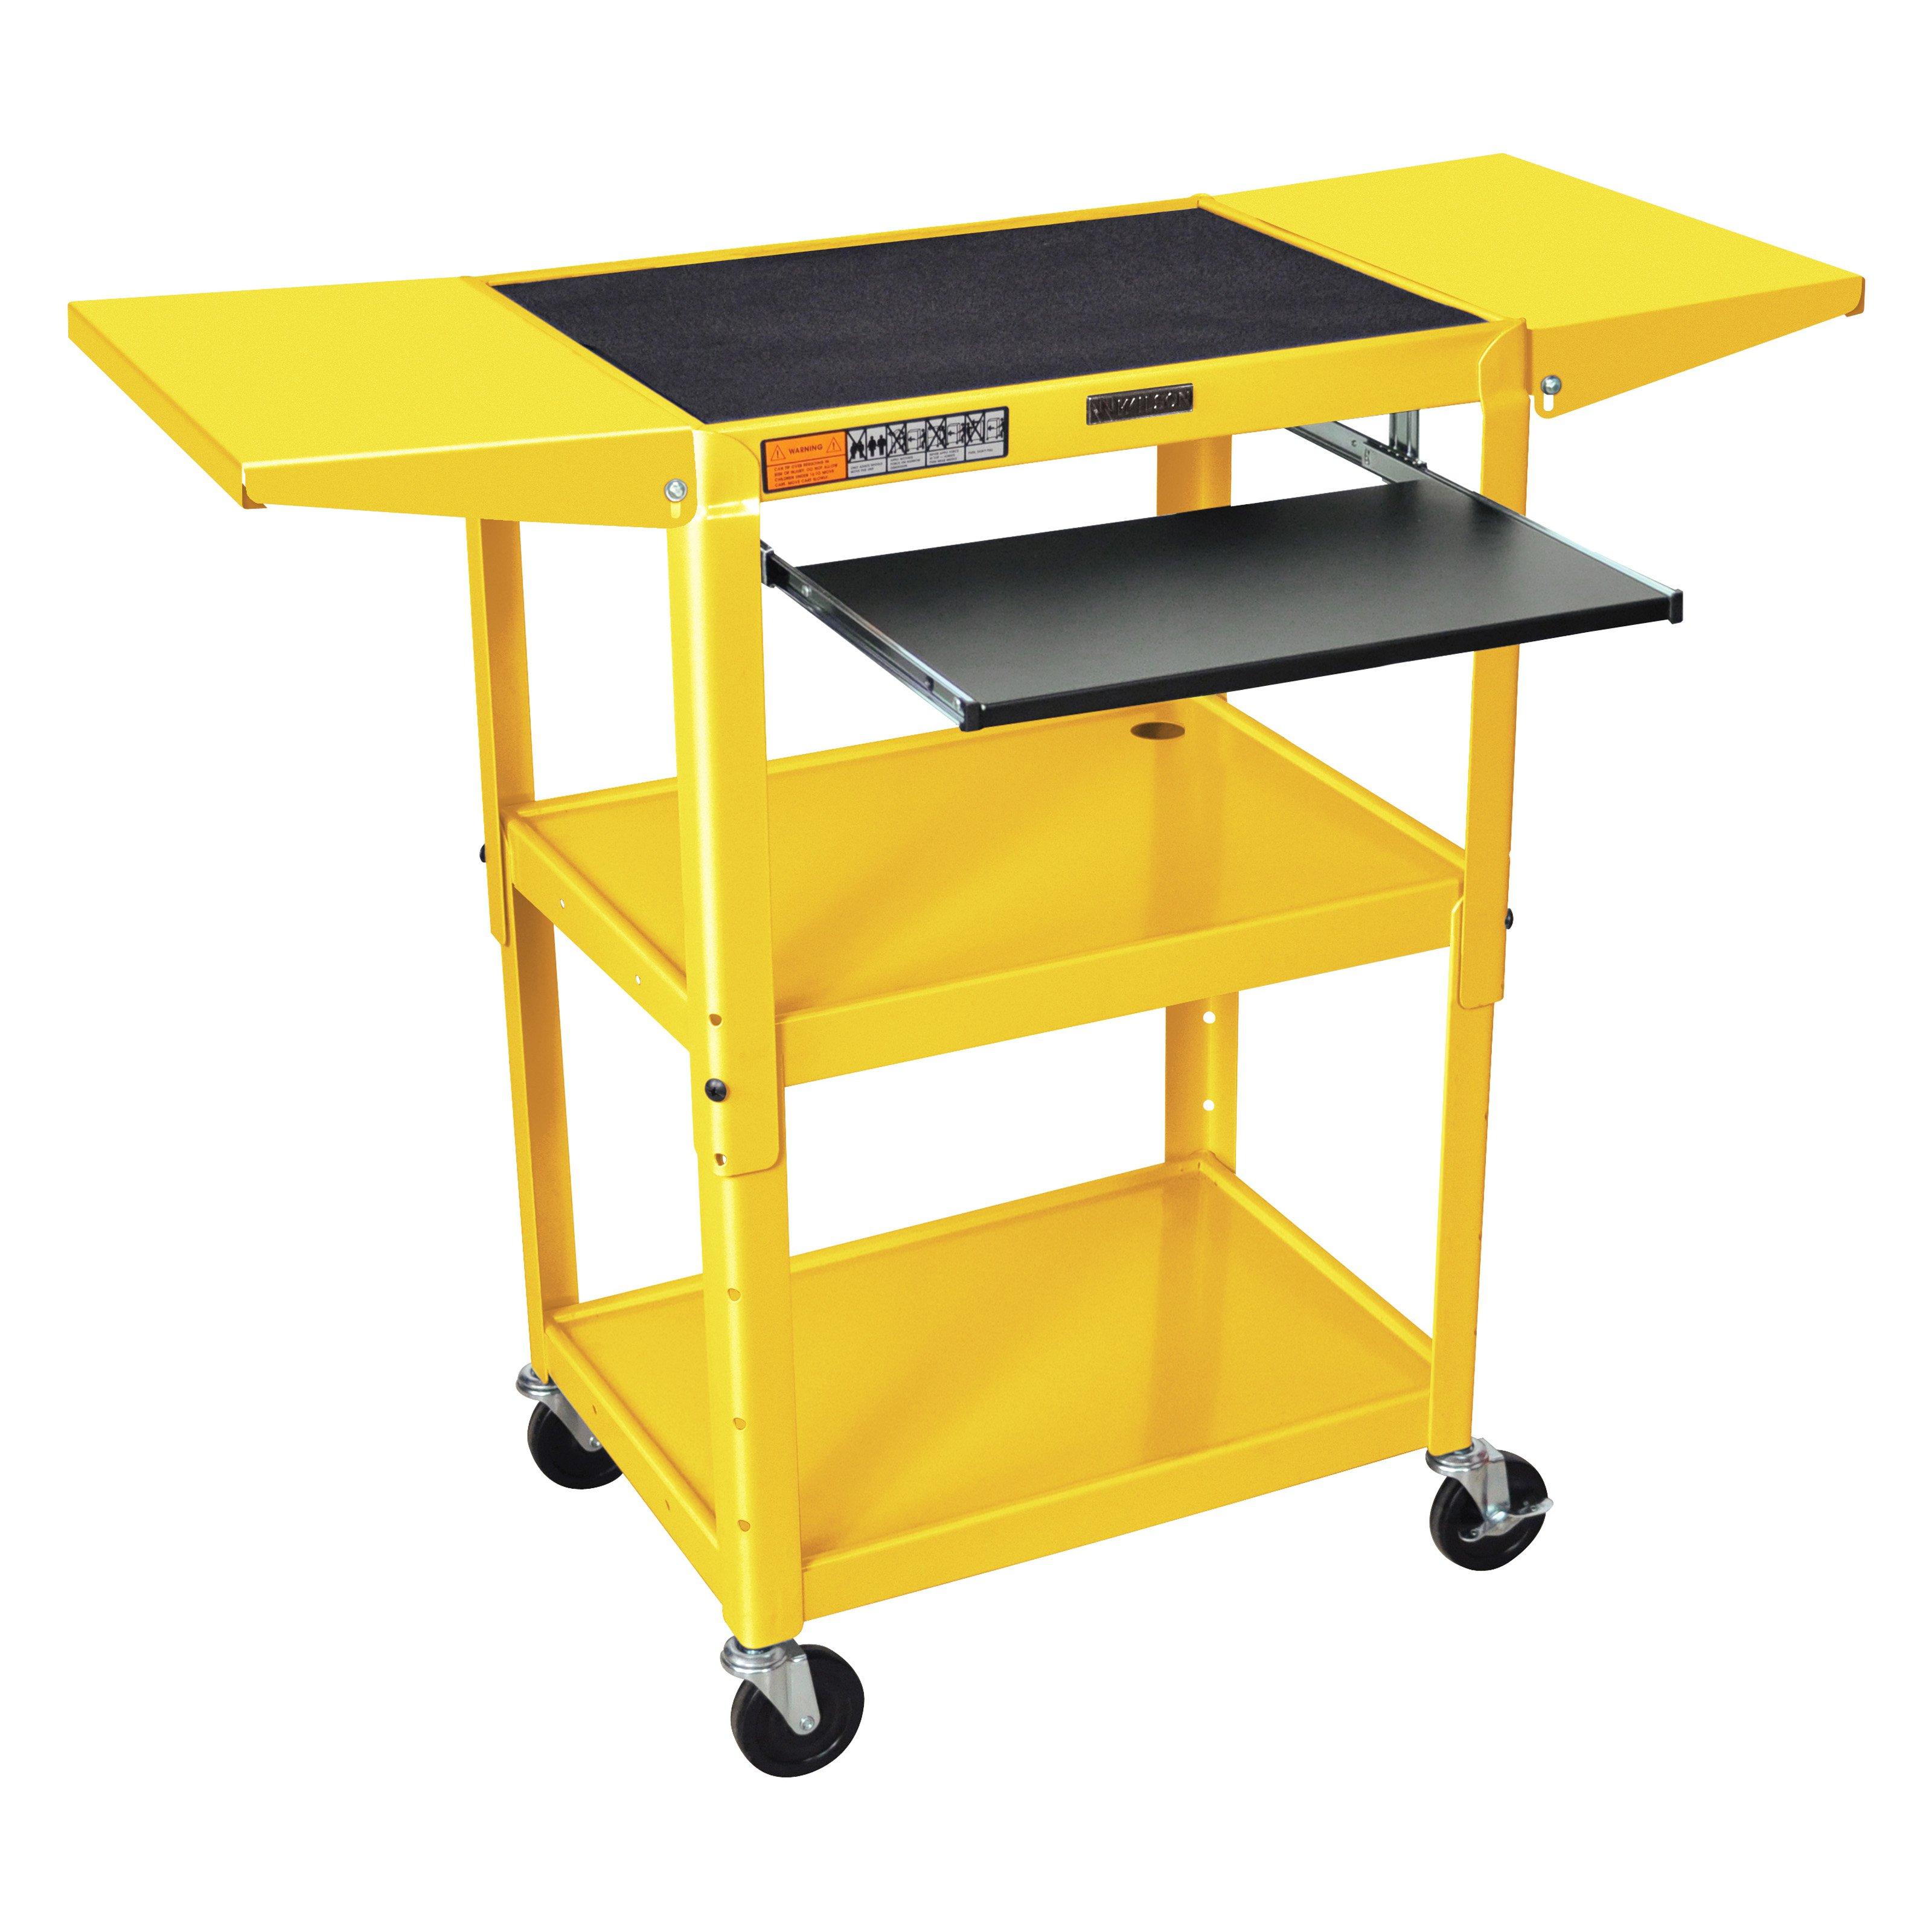 Adjustable-Height Steel AV Cart – Pullout Keyboard Tray, Drop Leaf